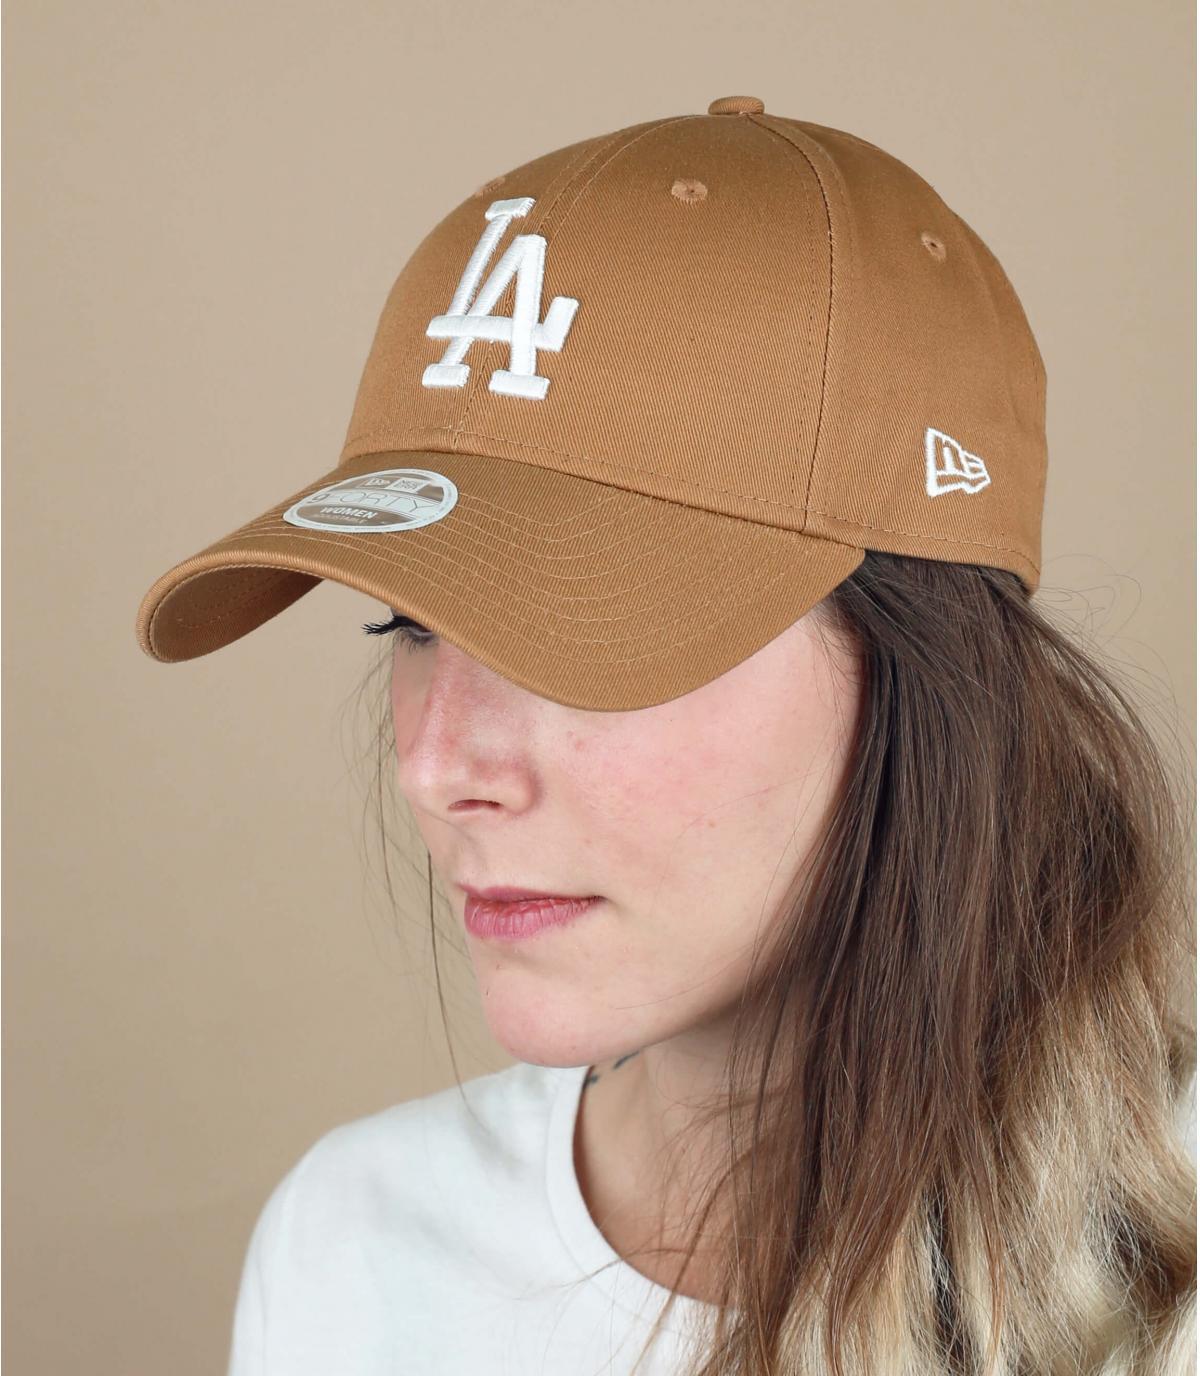 Damen Cap LA beige